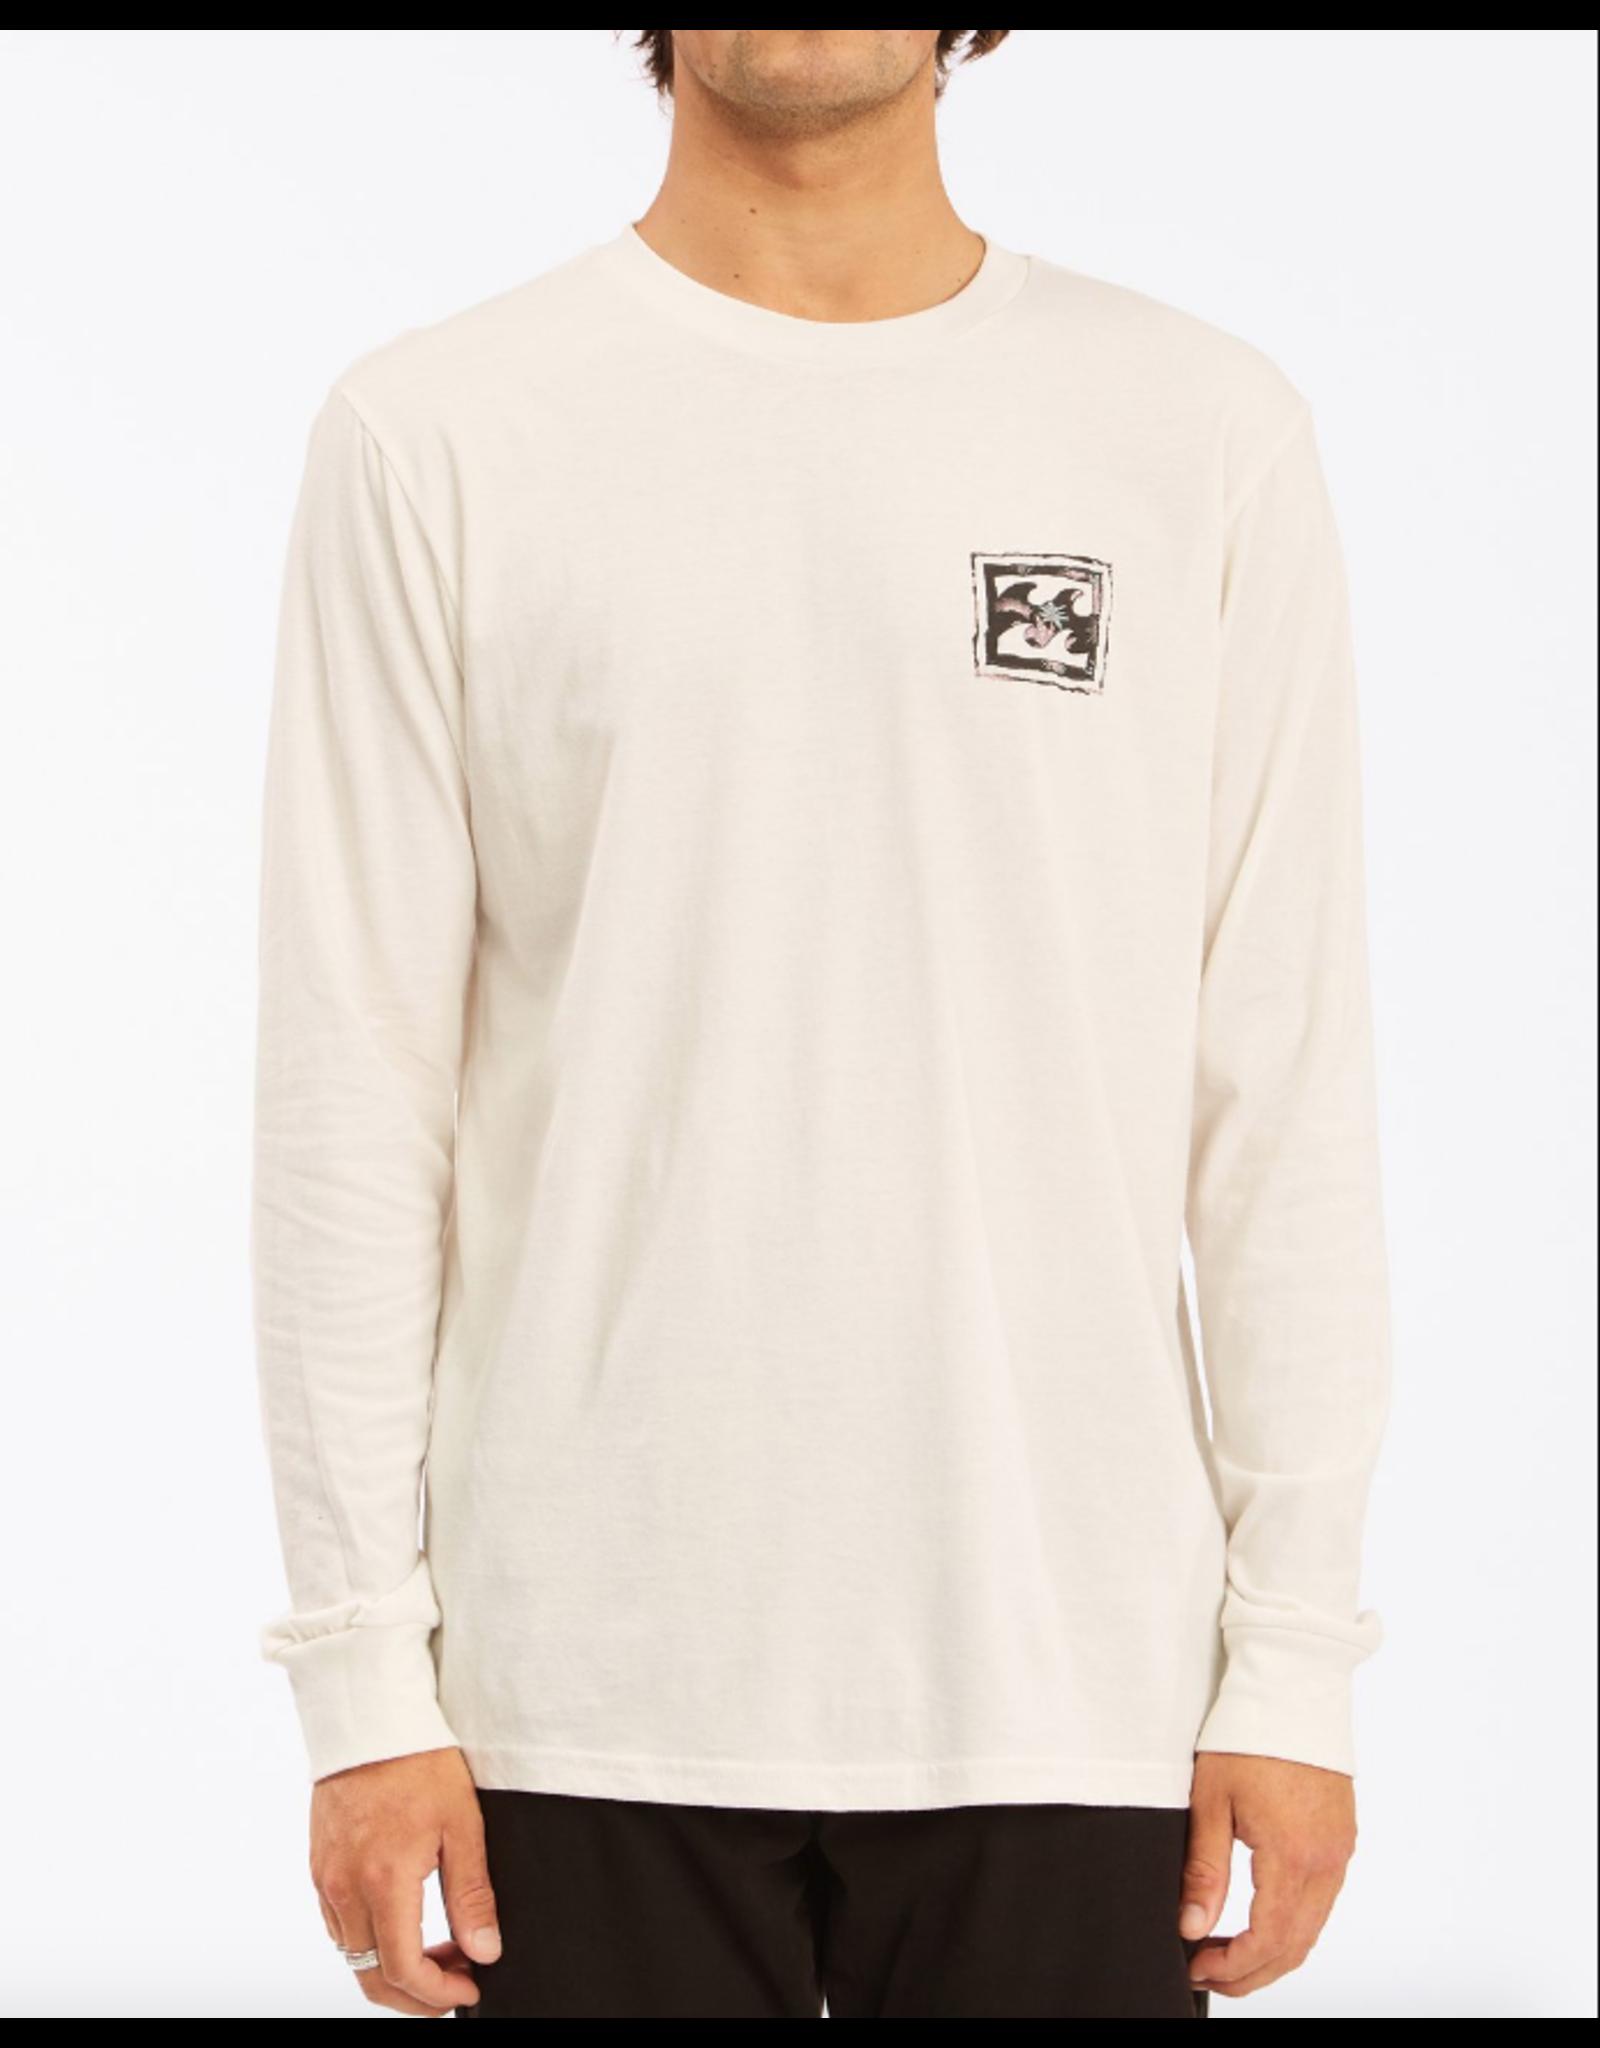 Billabong Guys Crayon Wave Long Sleeve T-Shirt